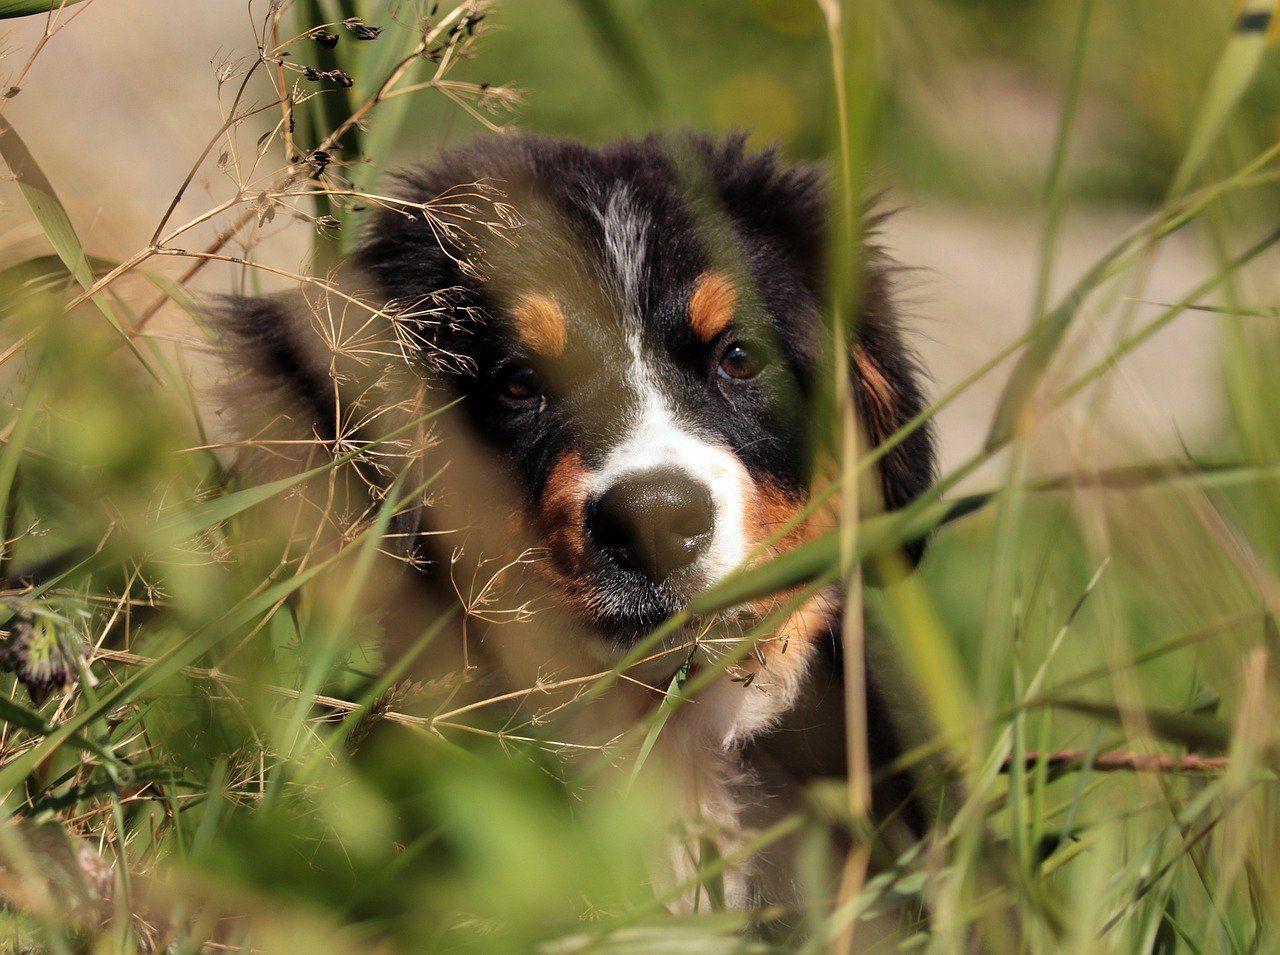 bernese mountain dog, dog, puppy